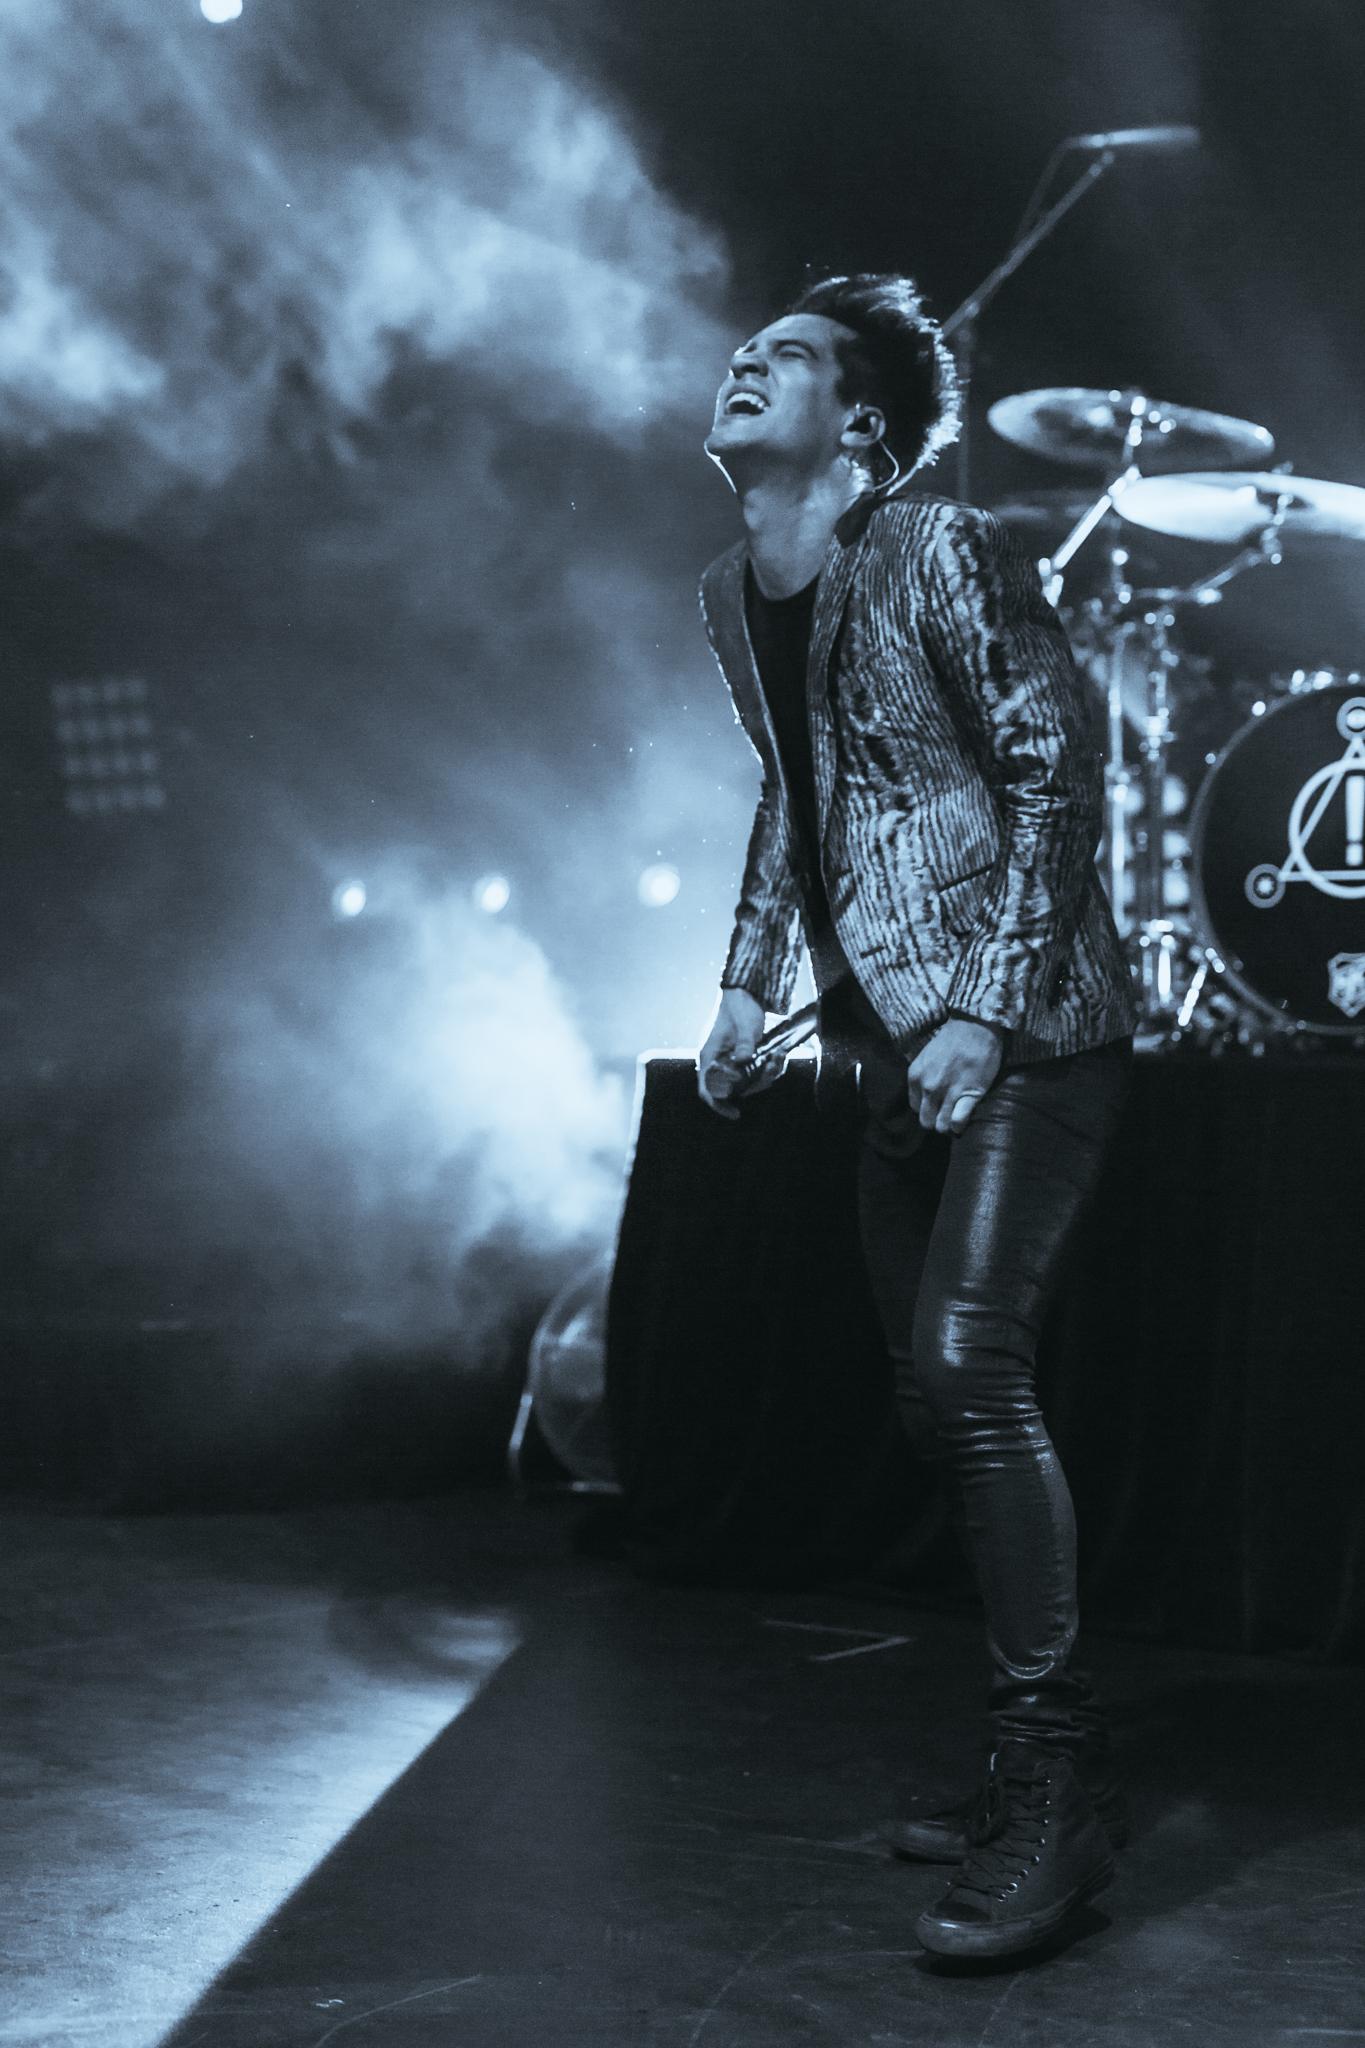 Mitch Lowe Photo - Panic At The Disco - Riverstage-43.jpg